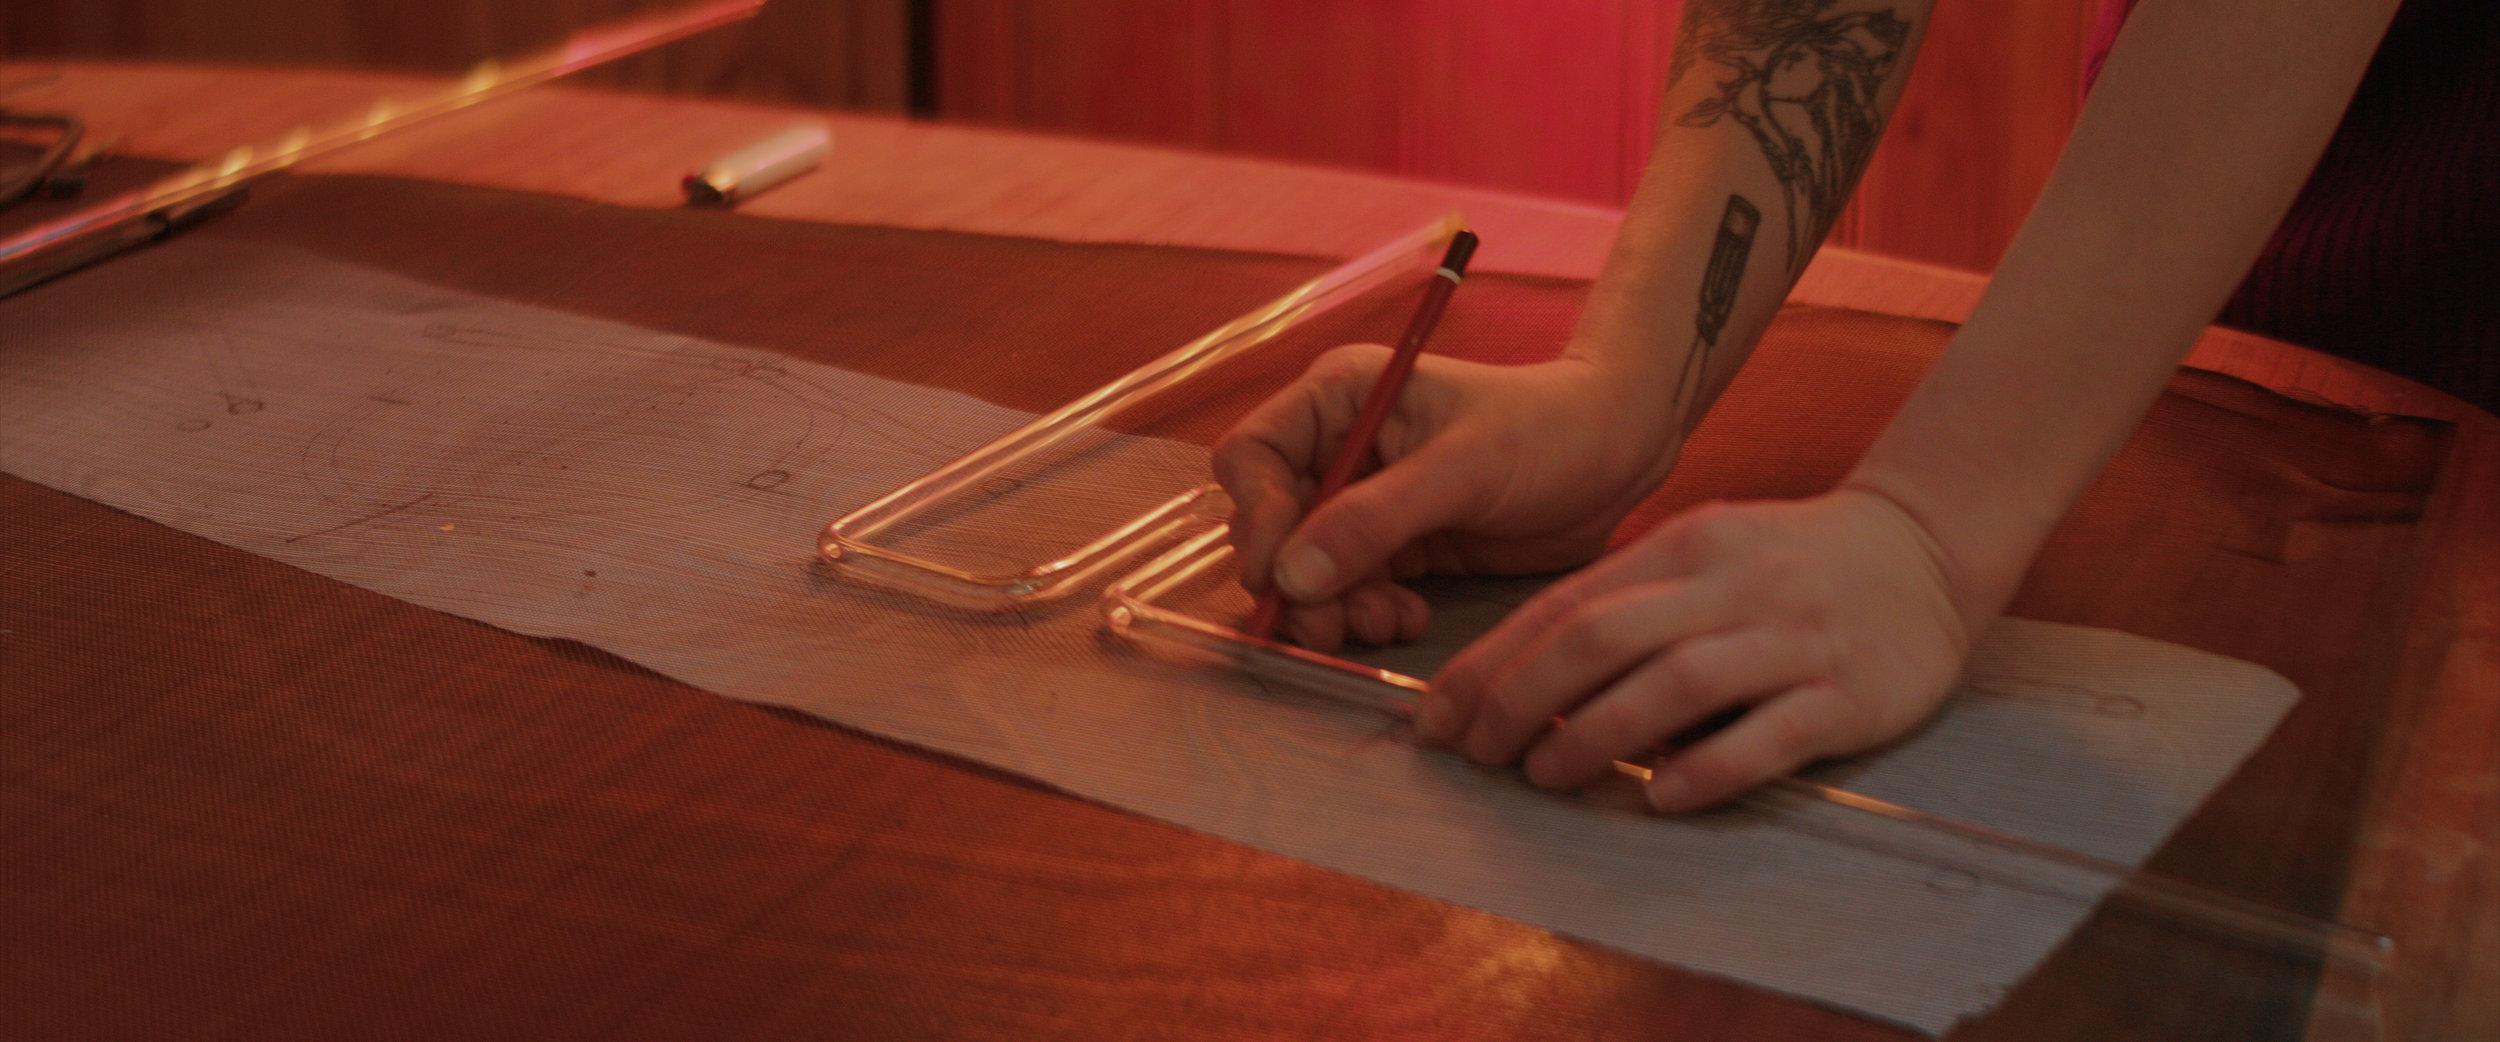 Emma-Kate Hart Bending Glass Close Up.jpg